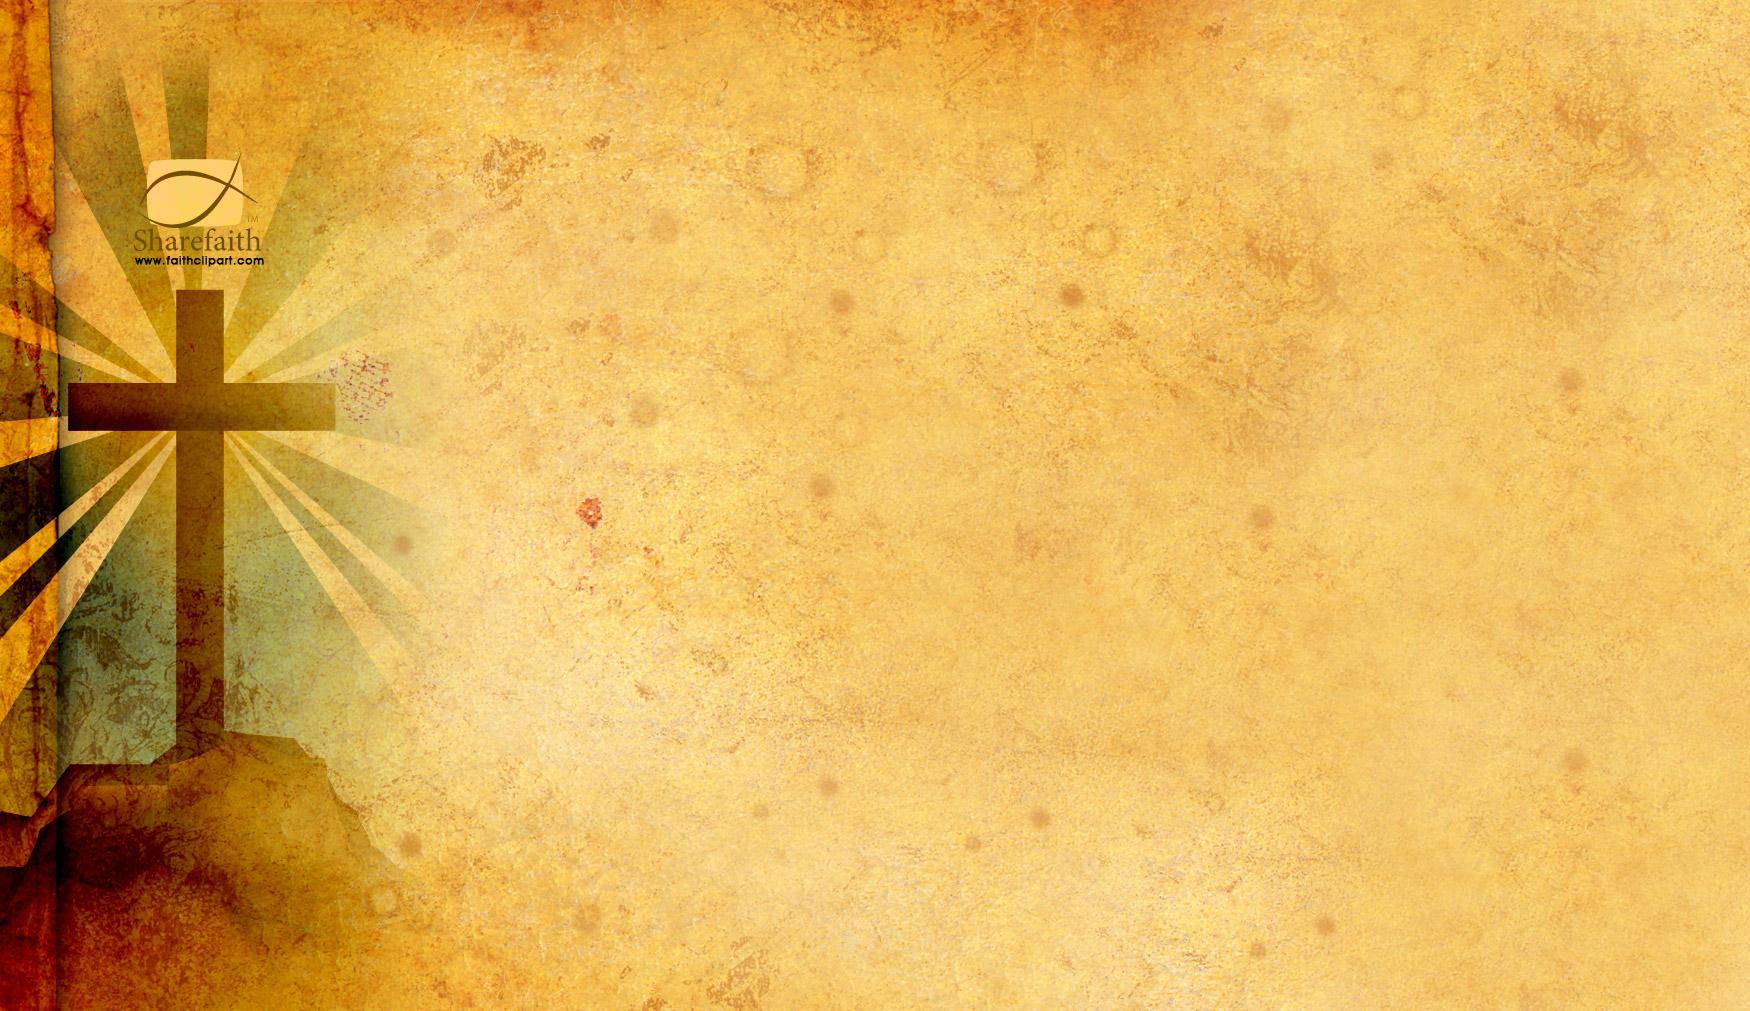 Religious Background Wallpaper - WallpaperSafari